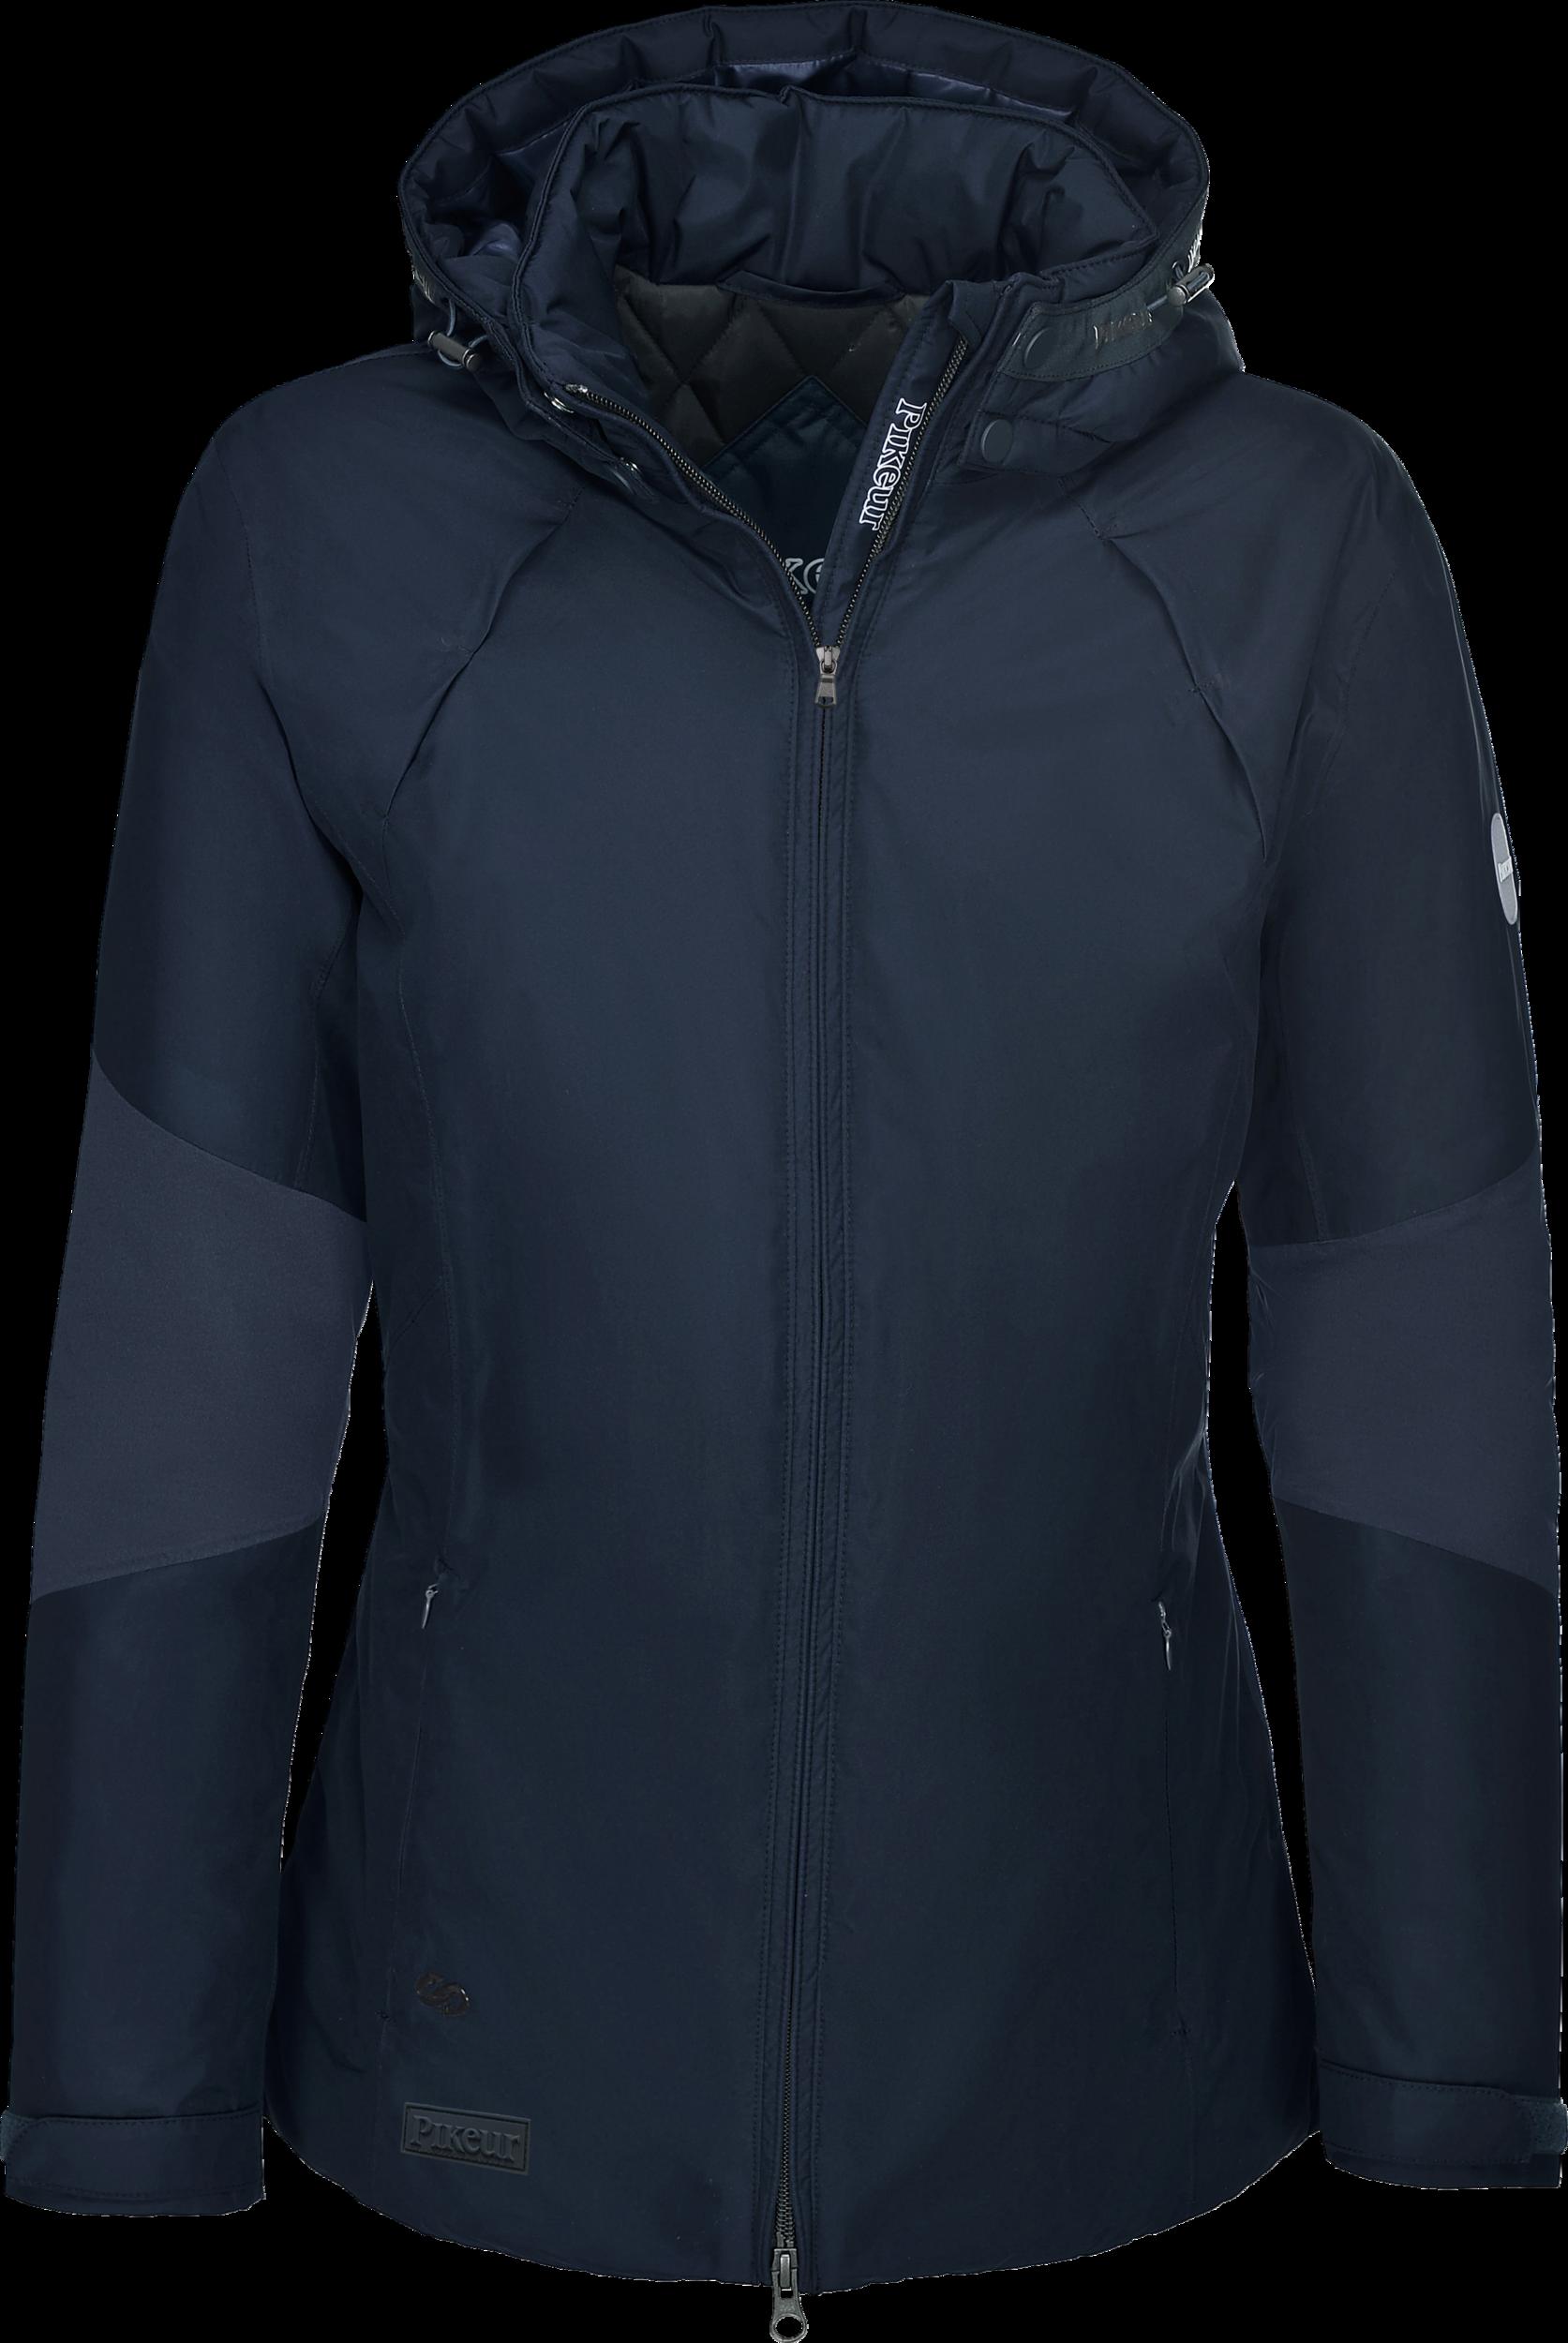 PAULINE AAC Jacket